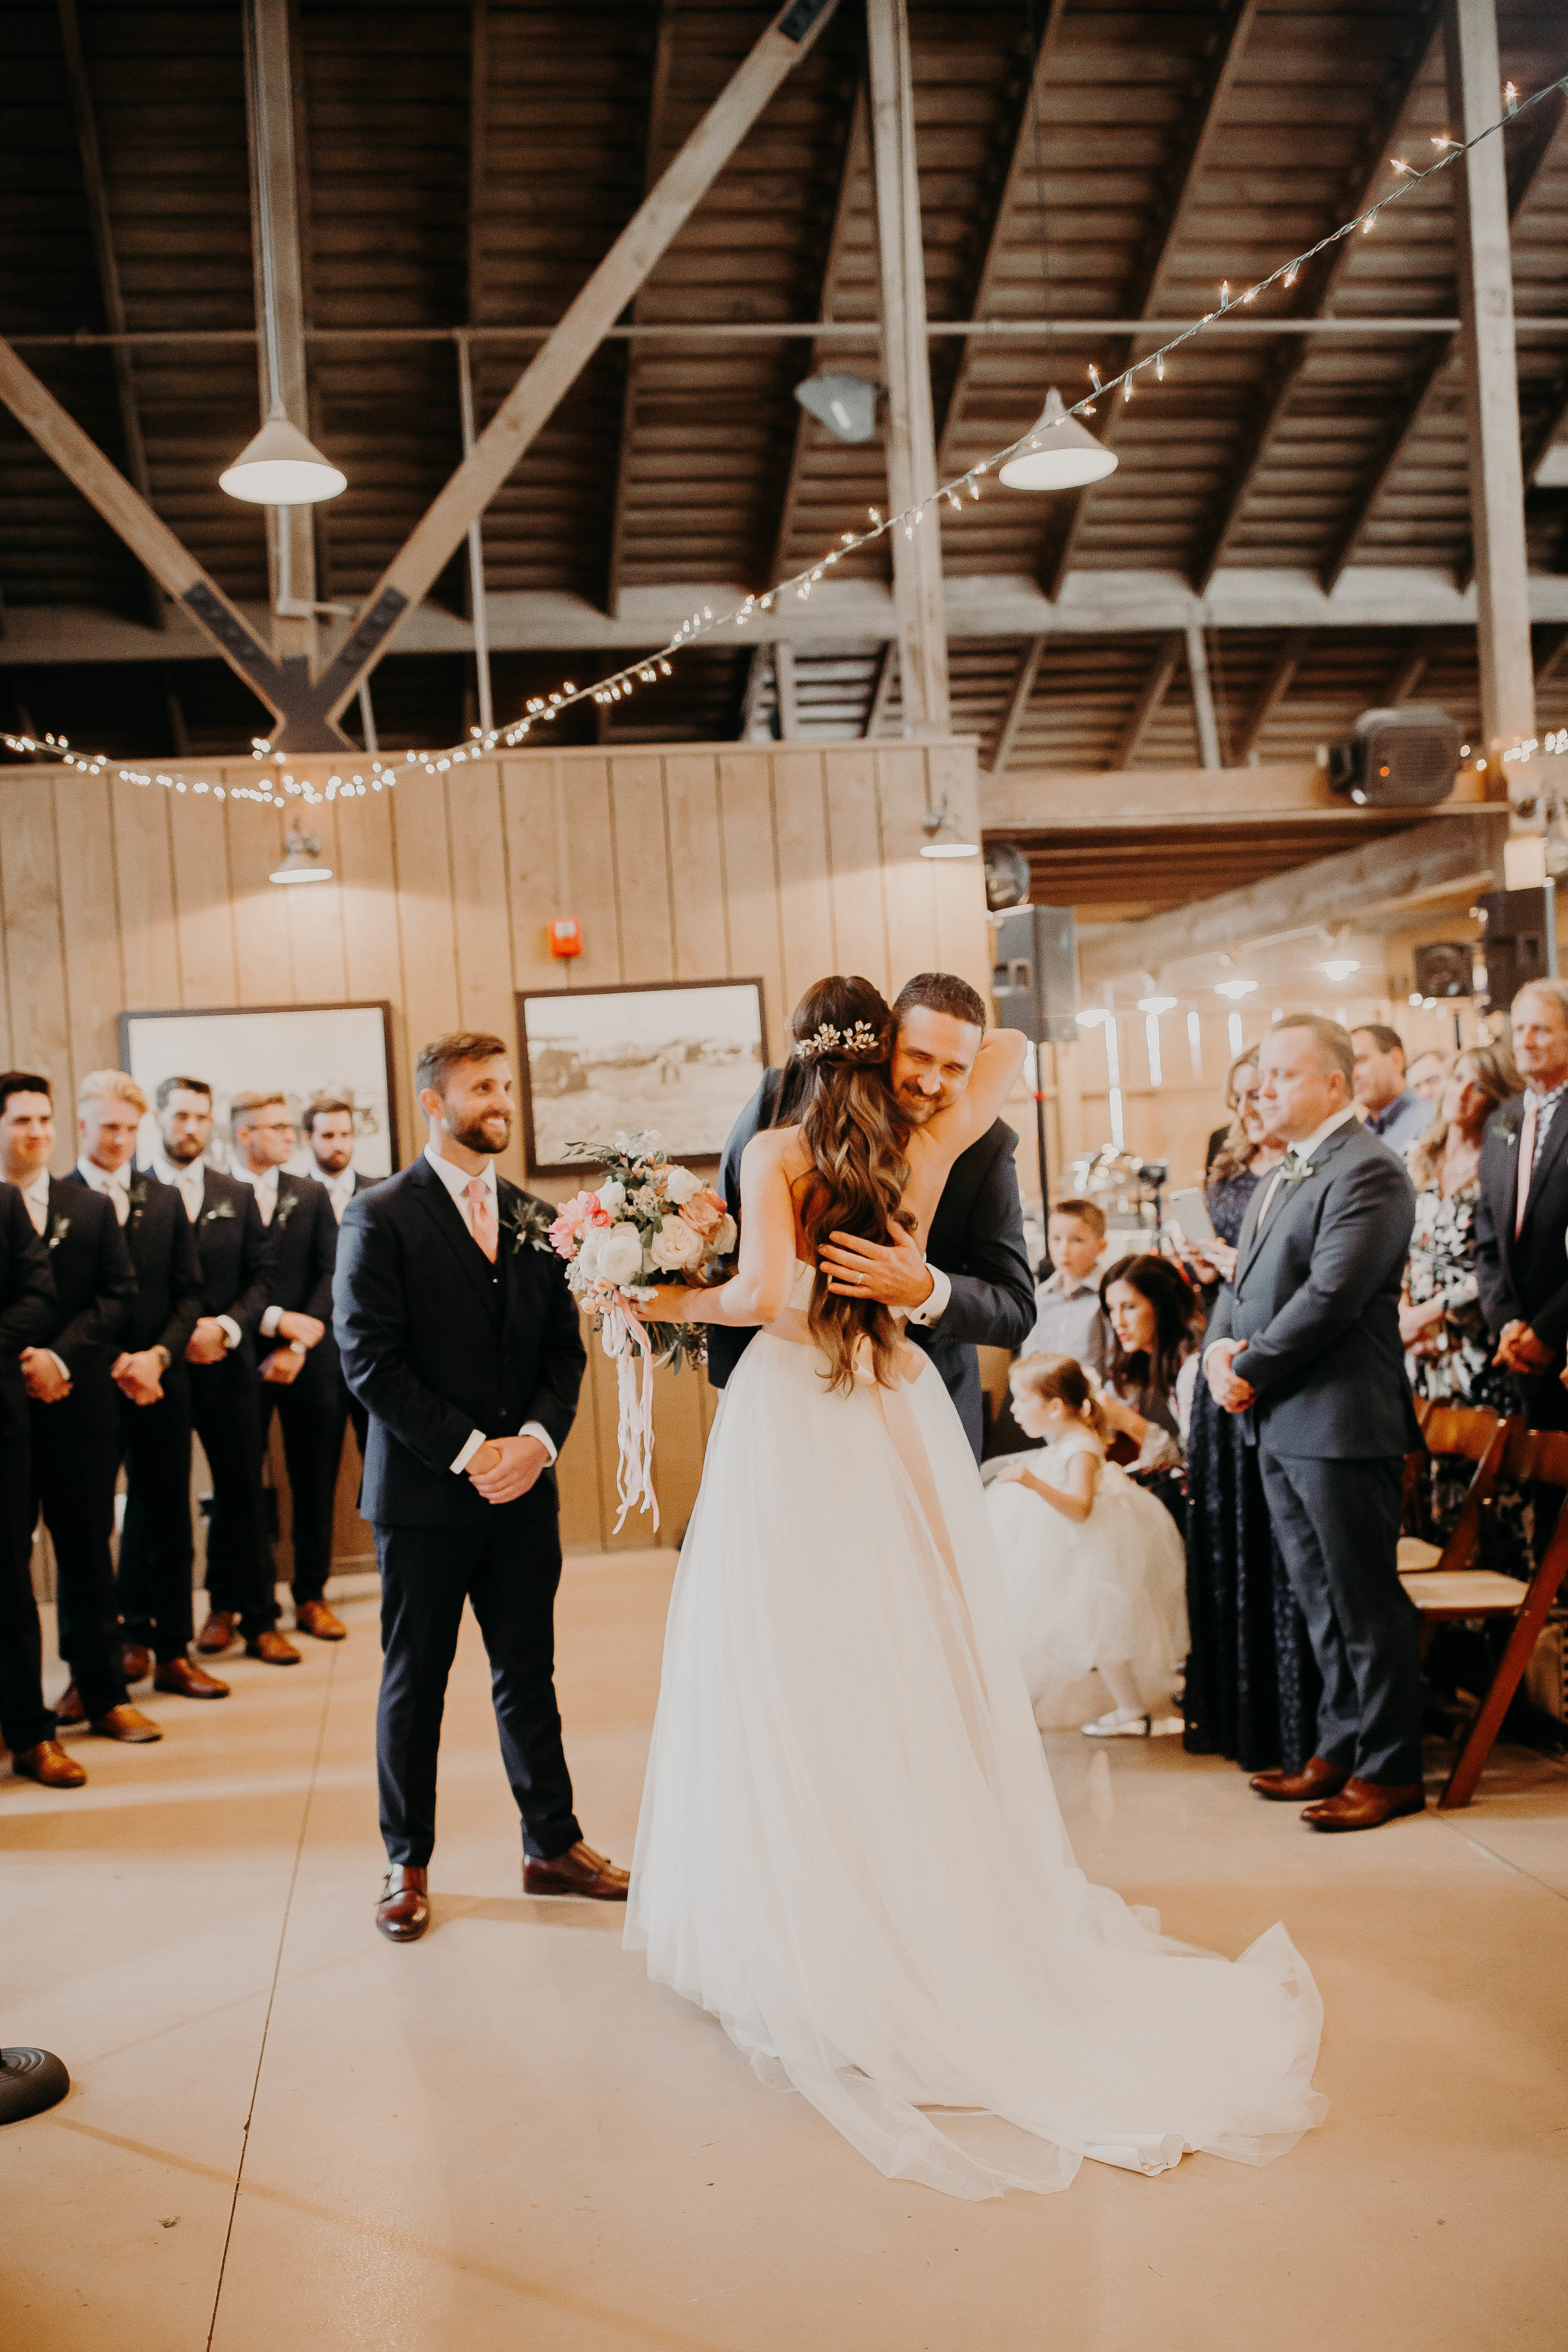 Blake and Cassidy Camarillo California Wedding 384.jpg